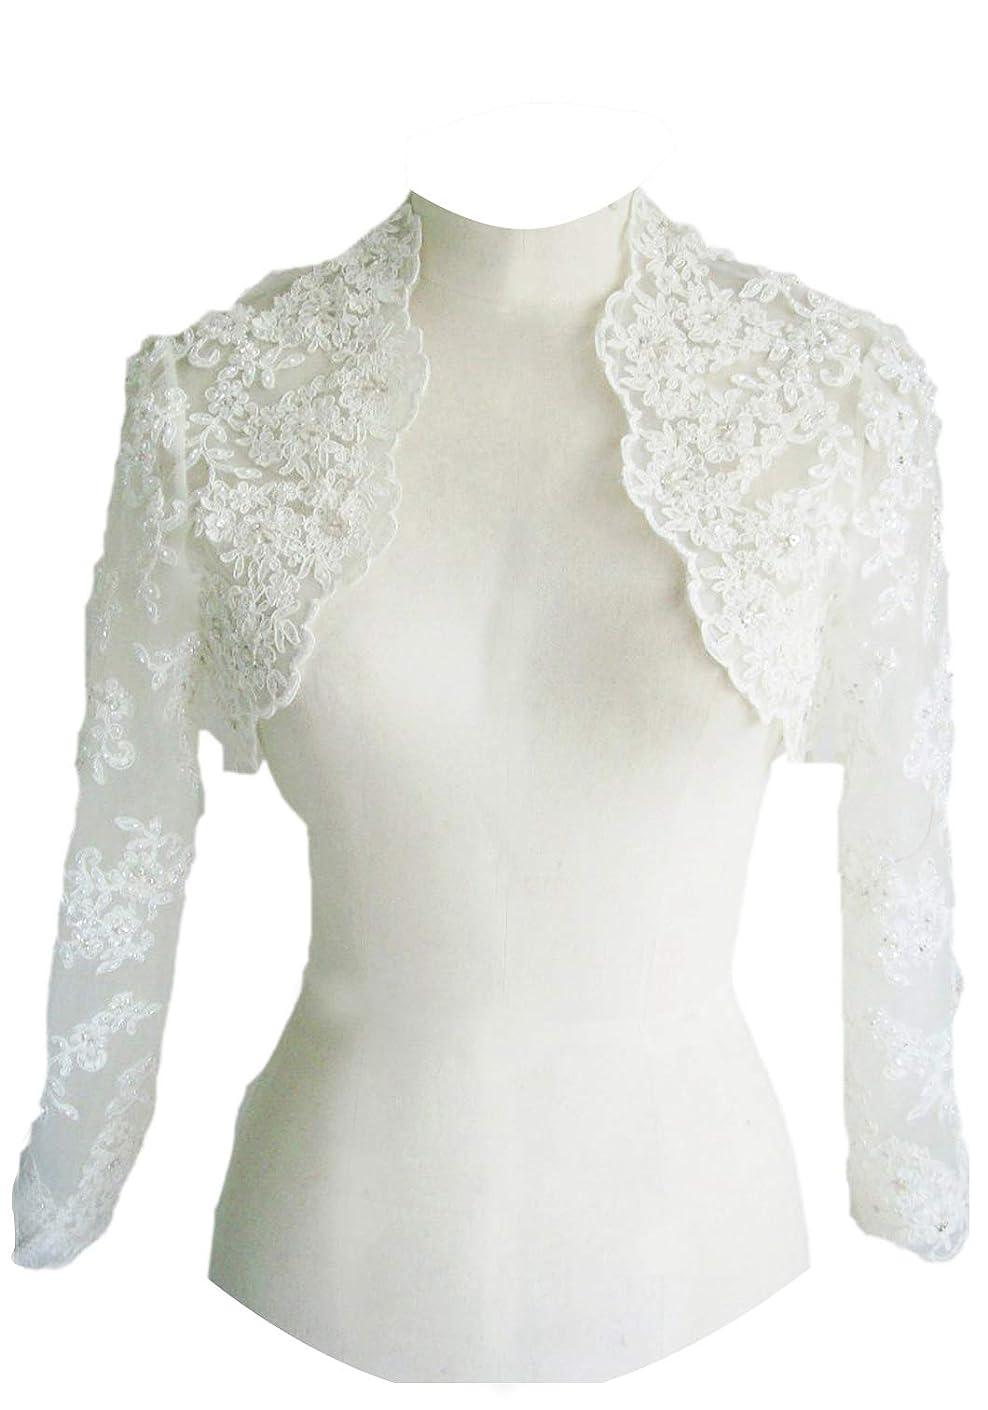 EllieHouse Women's Lace Wraps Wedding Bridal Bolero Jacket With Pearls WJ16